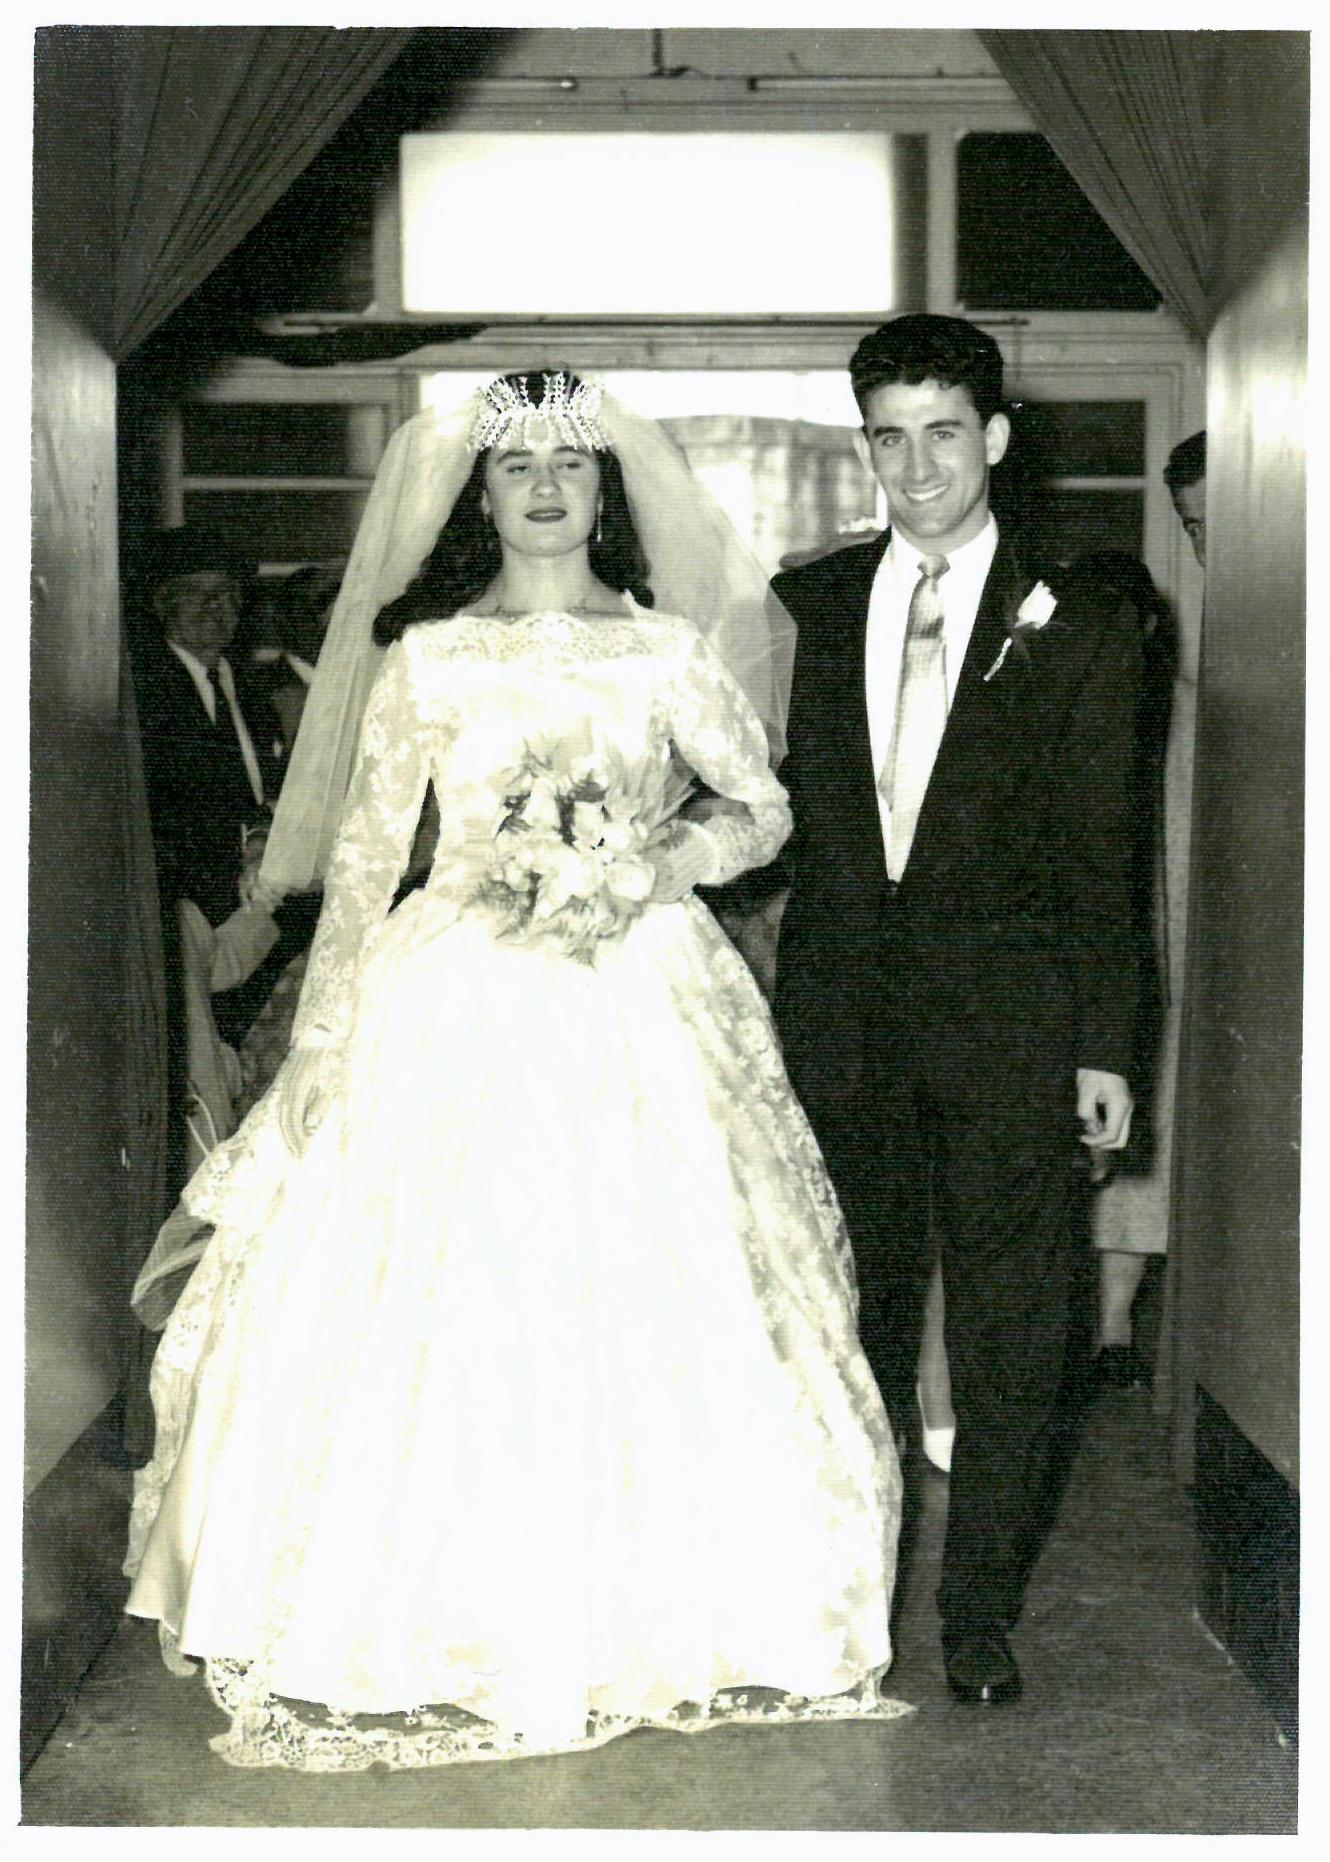 Sunbury wedding celebrant